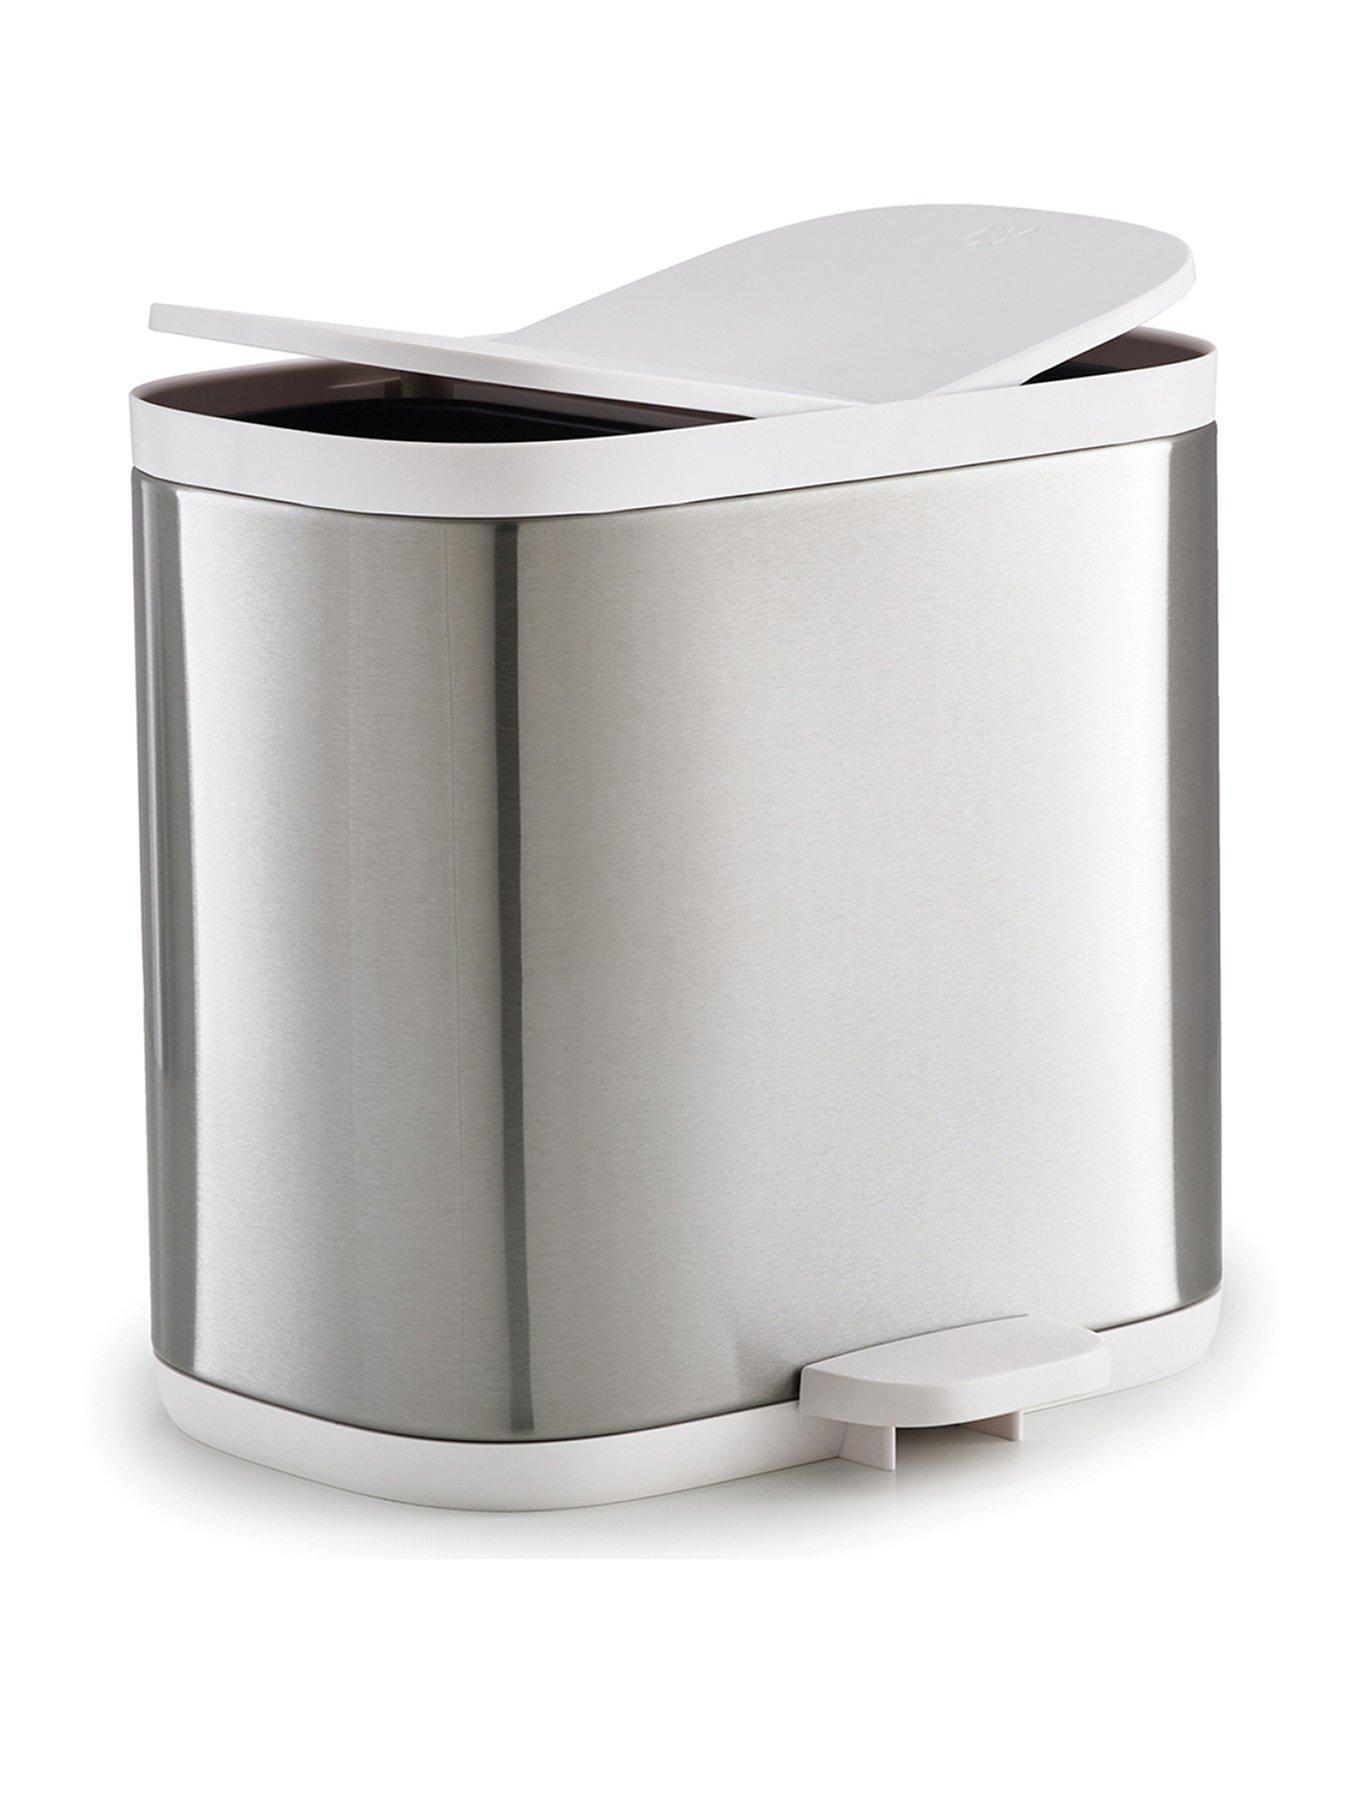 Joseph Joseph Split Steel Recycler Waste Bin In One Colour Bathroom Bin Recycler Bathroom Essentials